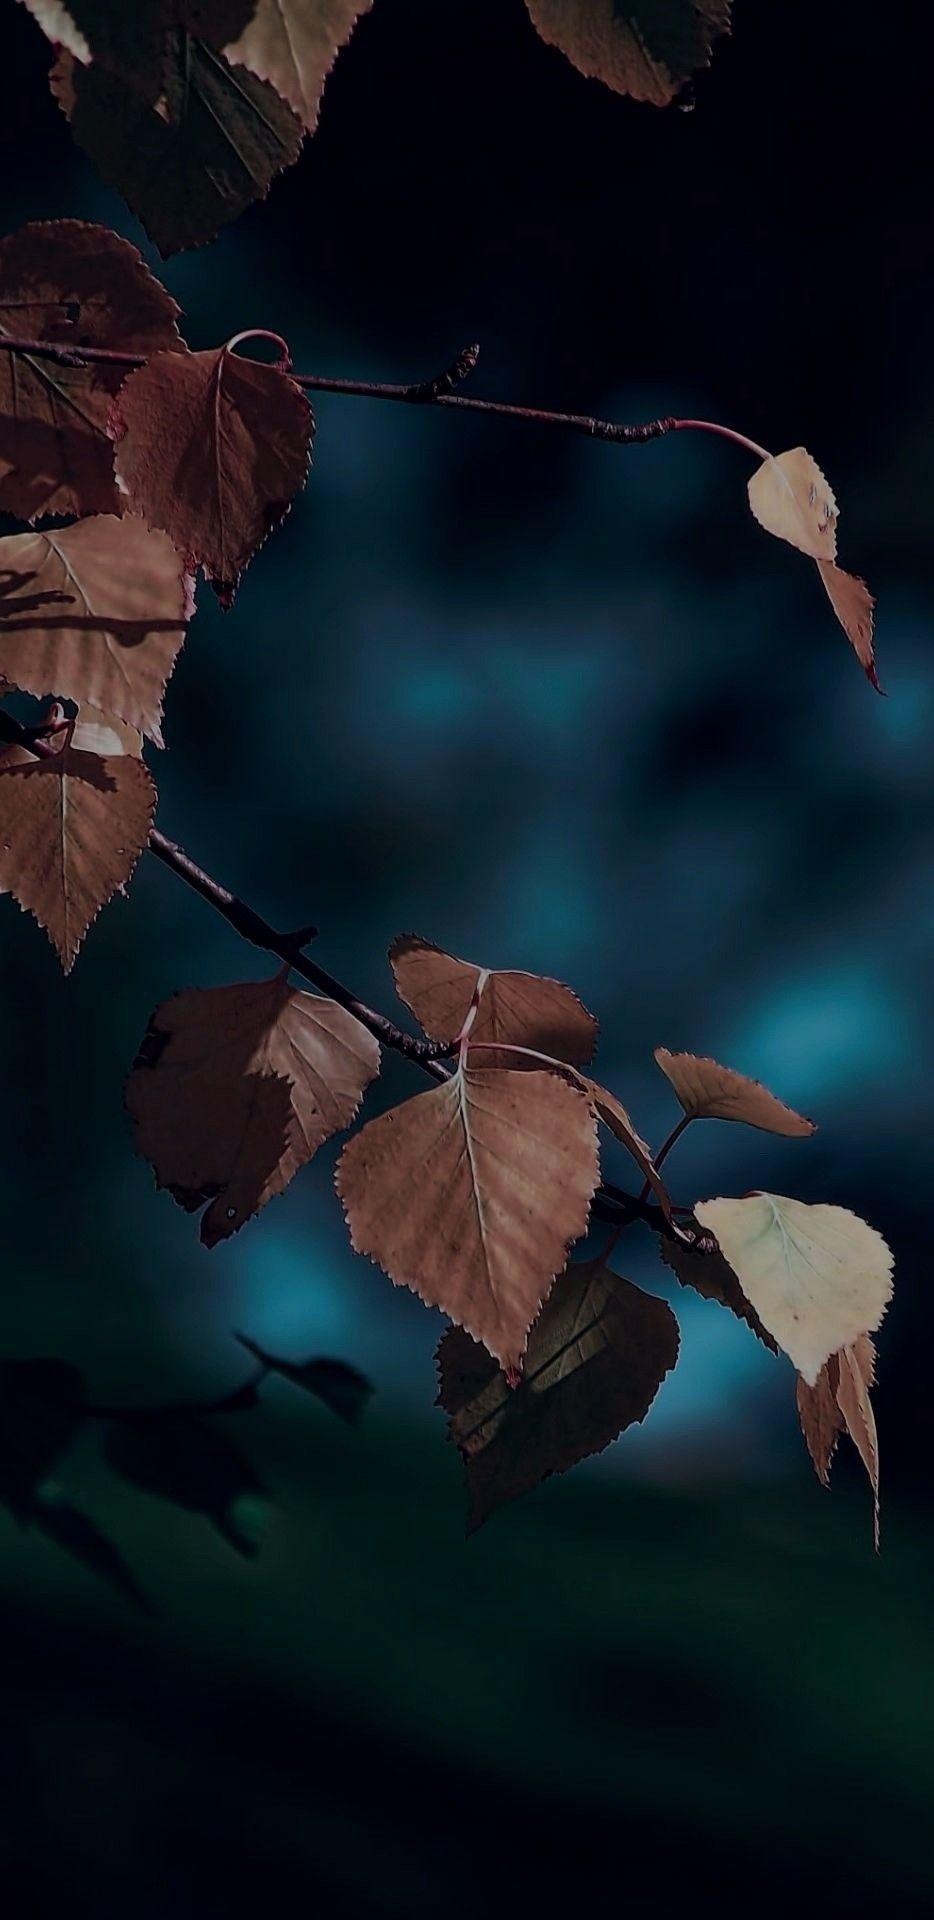 Get Best Blue Wallpaper For Iphone Today Di 2020 Ilustrasi Alam Latar Belakang Pemandangan Khayalan